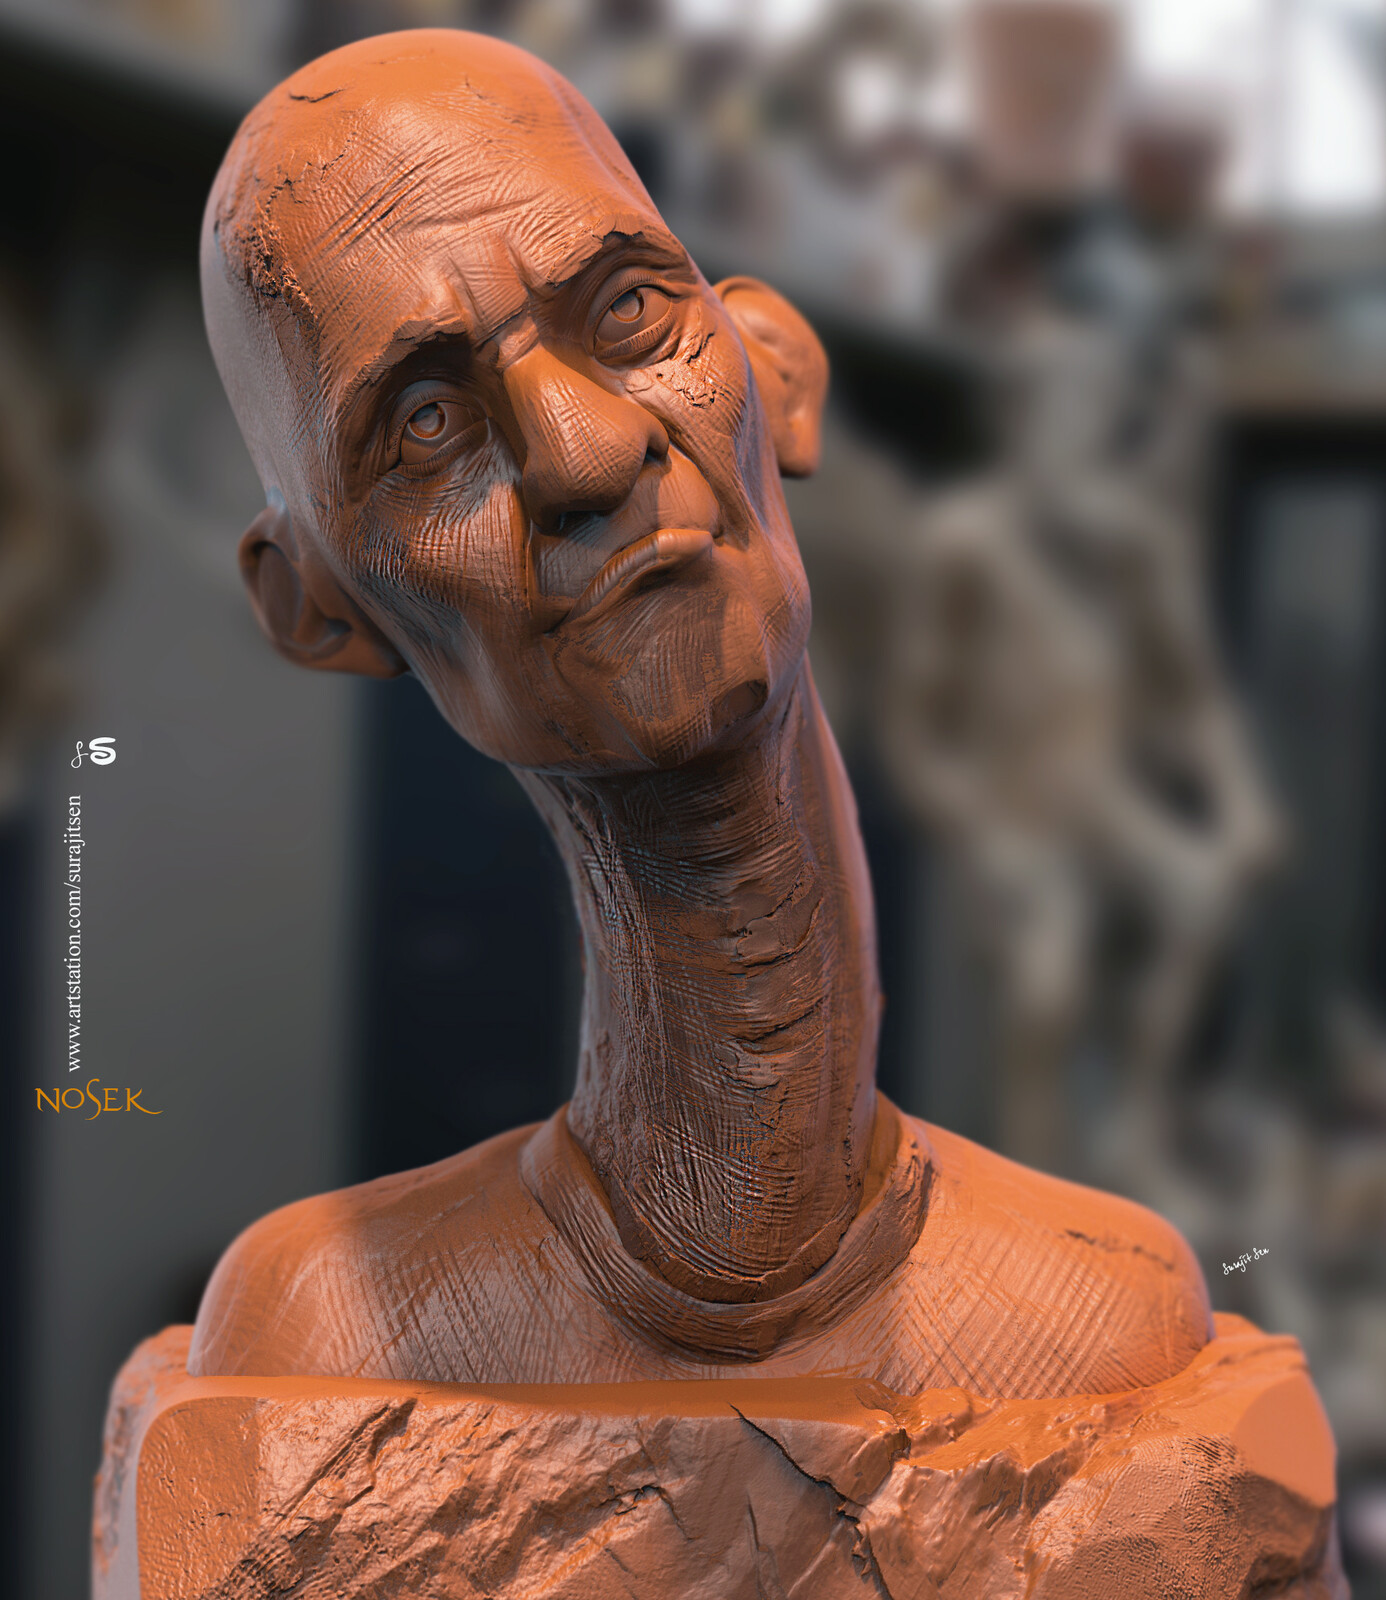 Nosek Quick blocking. Digital Sculpture. Wish to share. #surajitsen #artist #indianartist #digitalsculpting #study